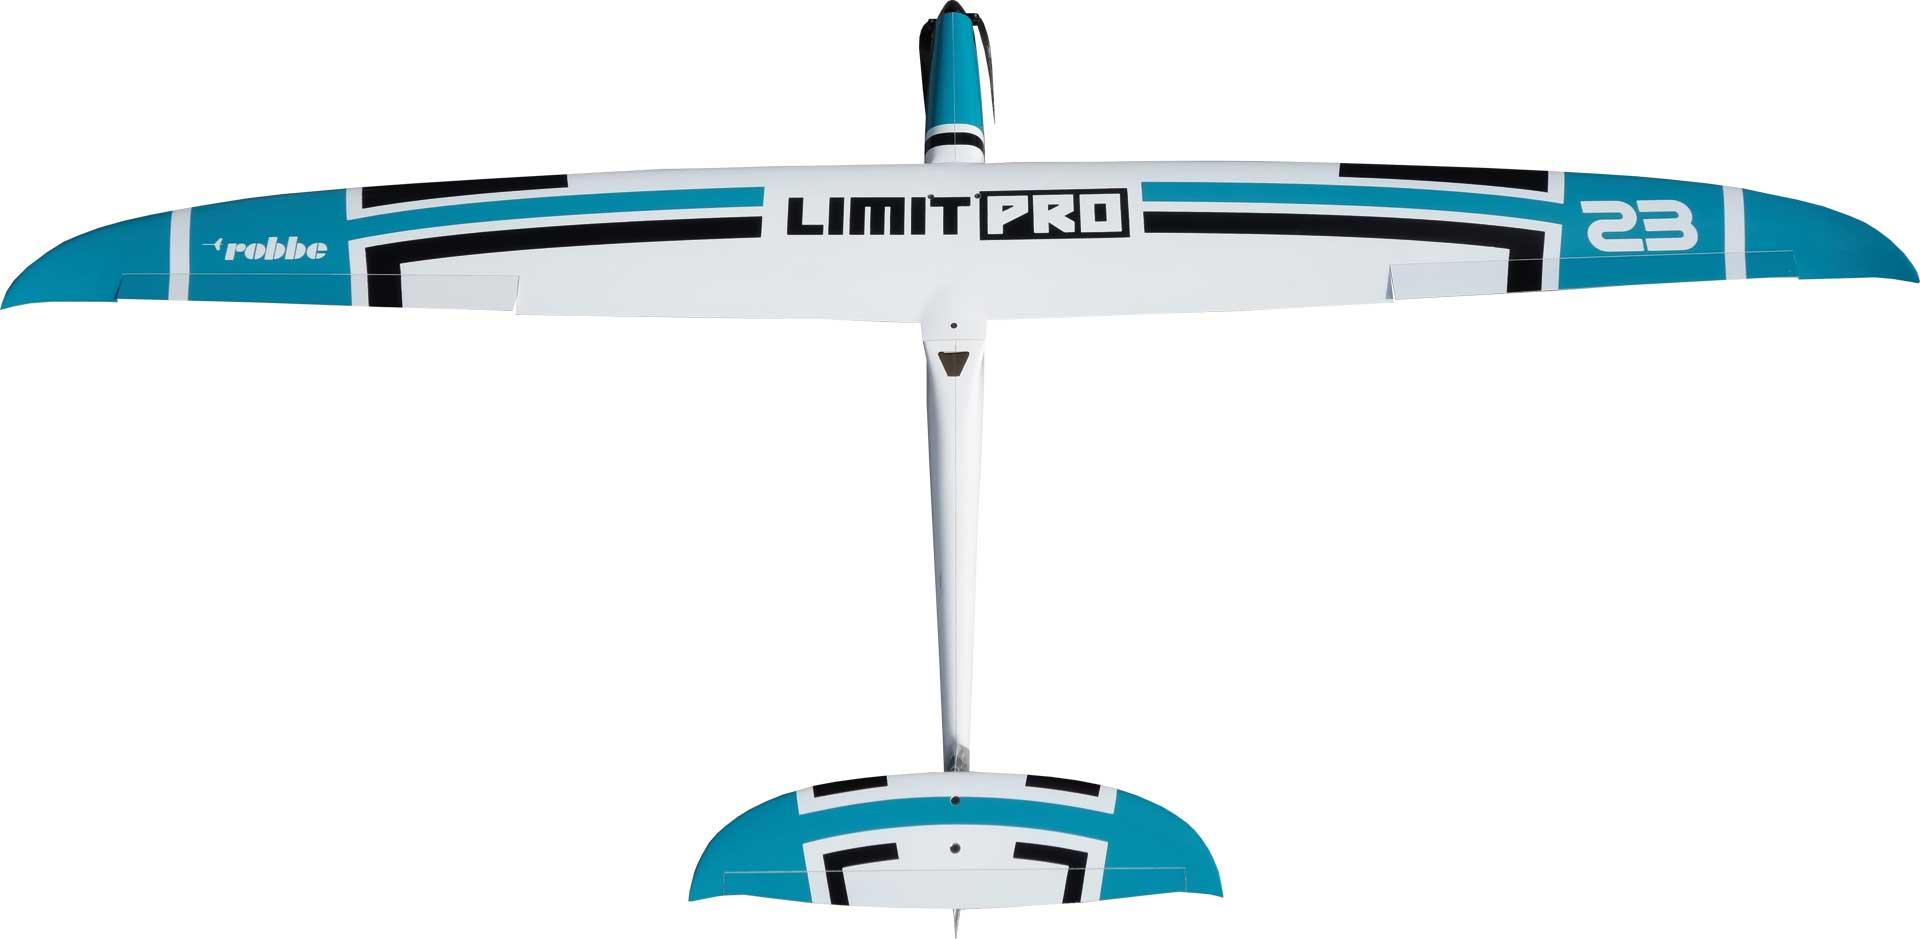 Robbe Modellsport Limit Pro ARF PETROL Full-GRP/CRP